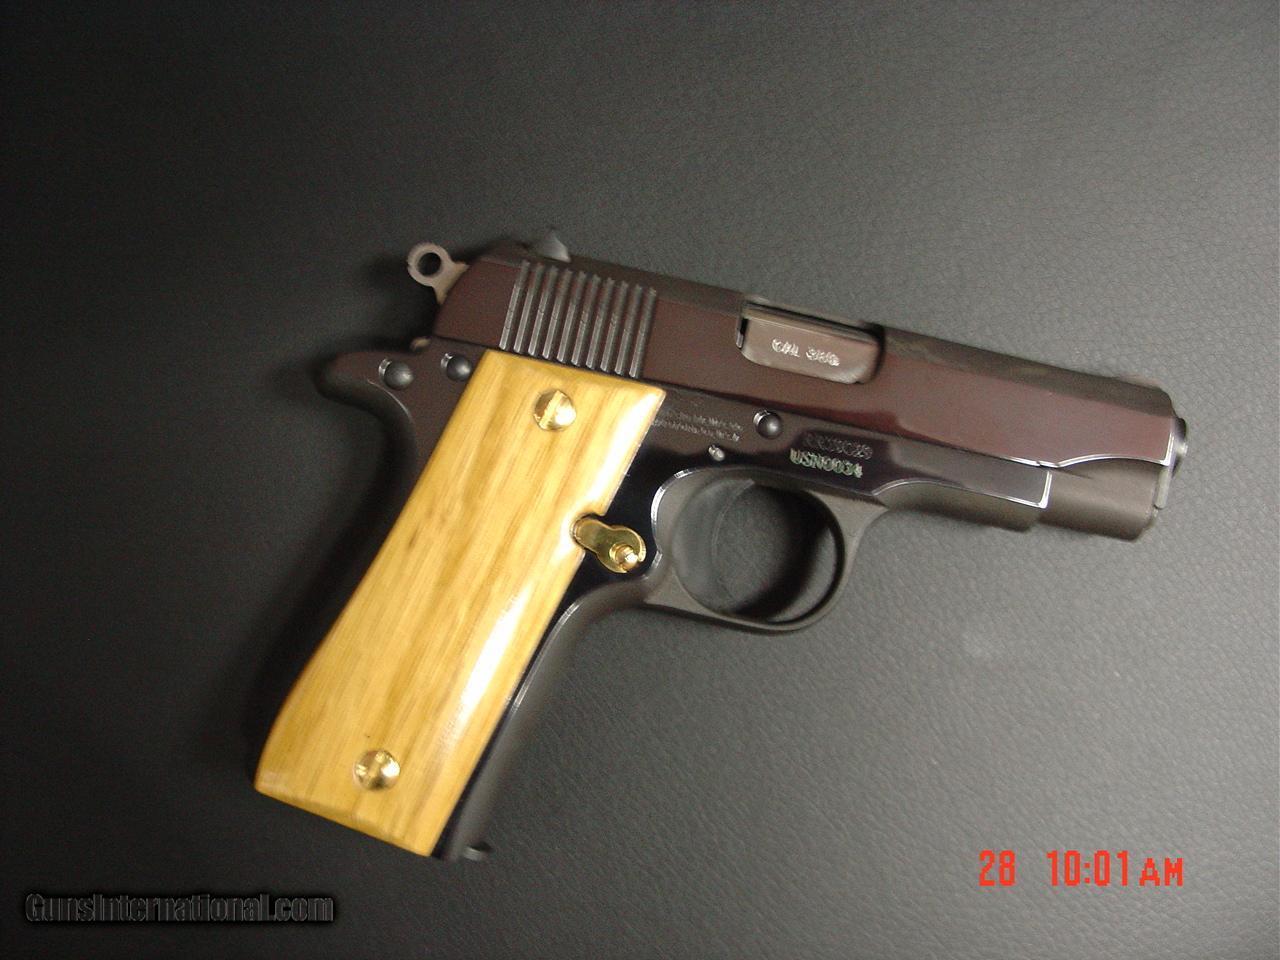 Colt 45 Manual 1996 Yfb250 Timberwolf Wiring Diagram Exploded Array Mustang 380 Us Navy Commemorativehigh Gloss Gold U0026 Bluebamboo Rh Gunsinternational Com